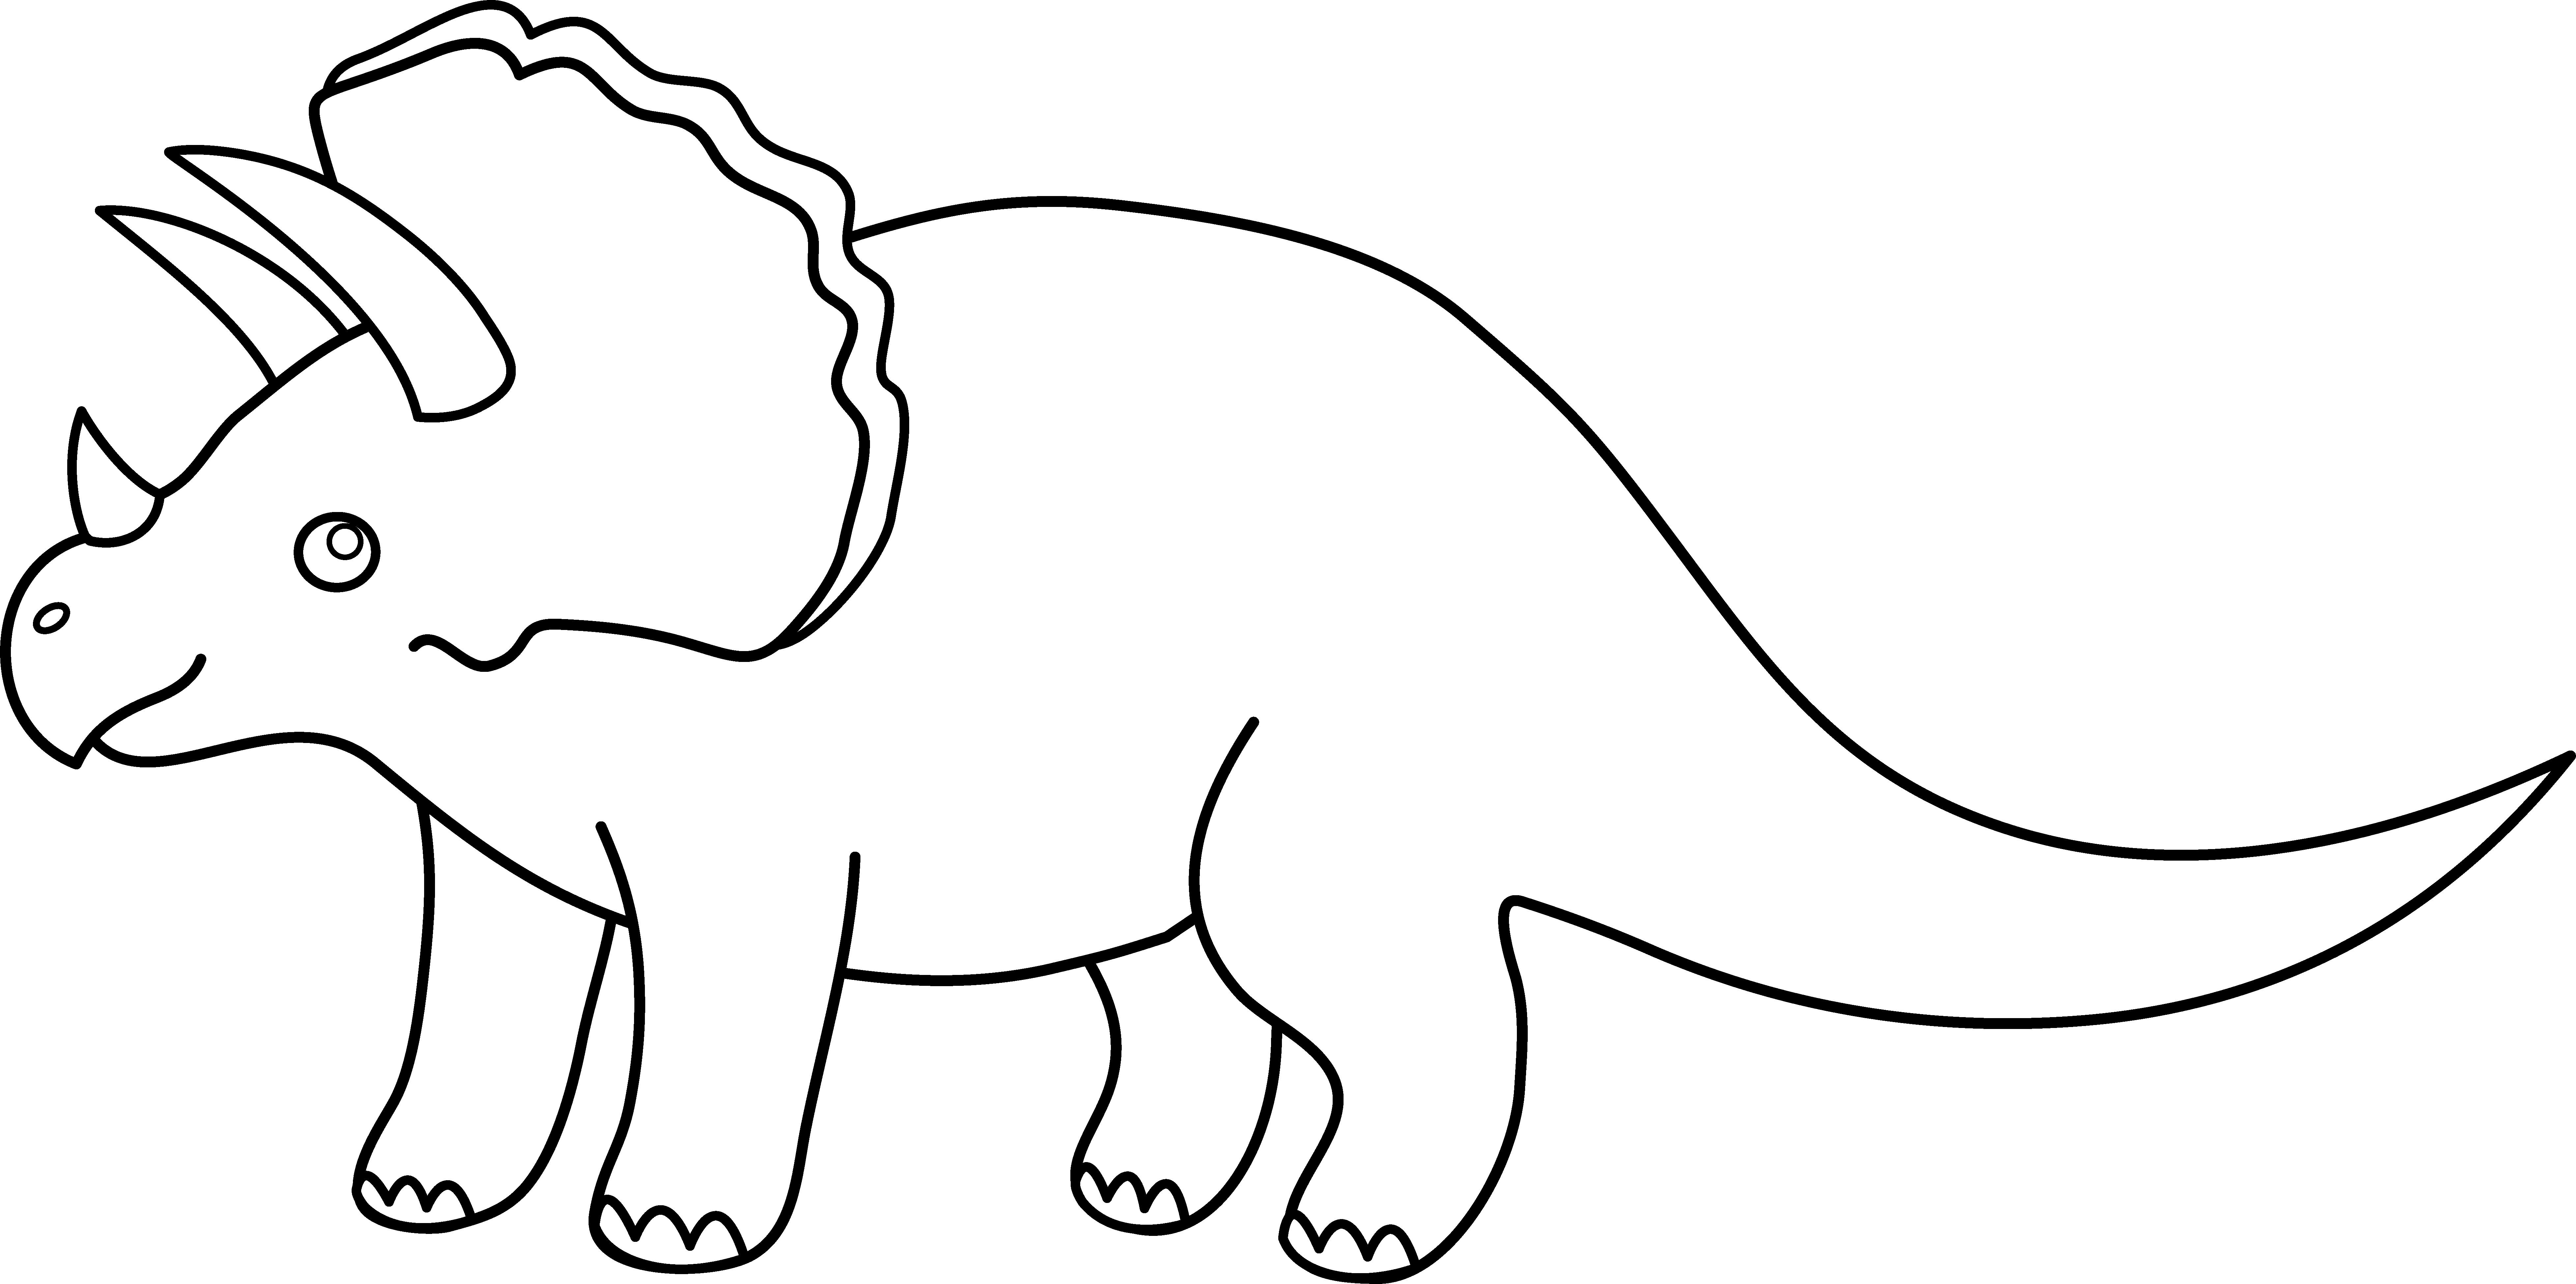 Tyrannosaurus Apatosaurus Carnotaurus Stegosaurus Clip art.